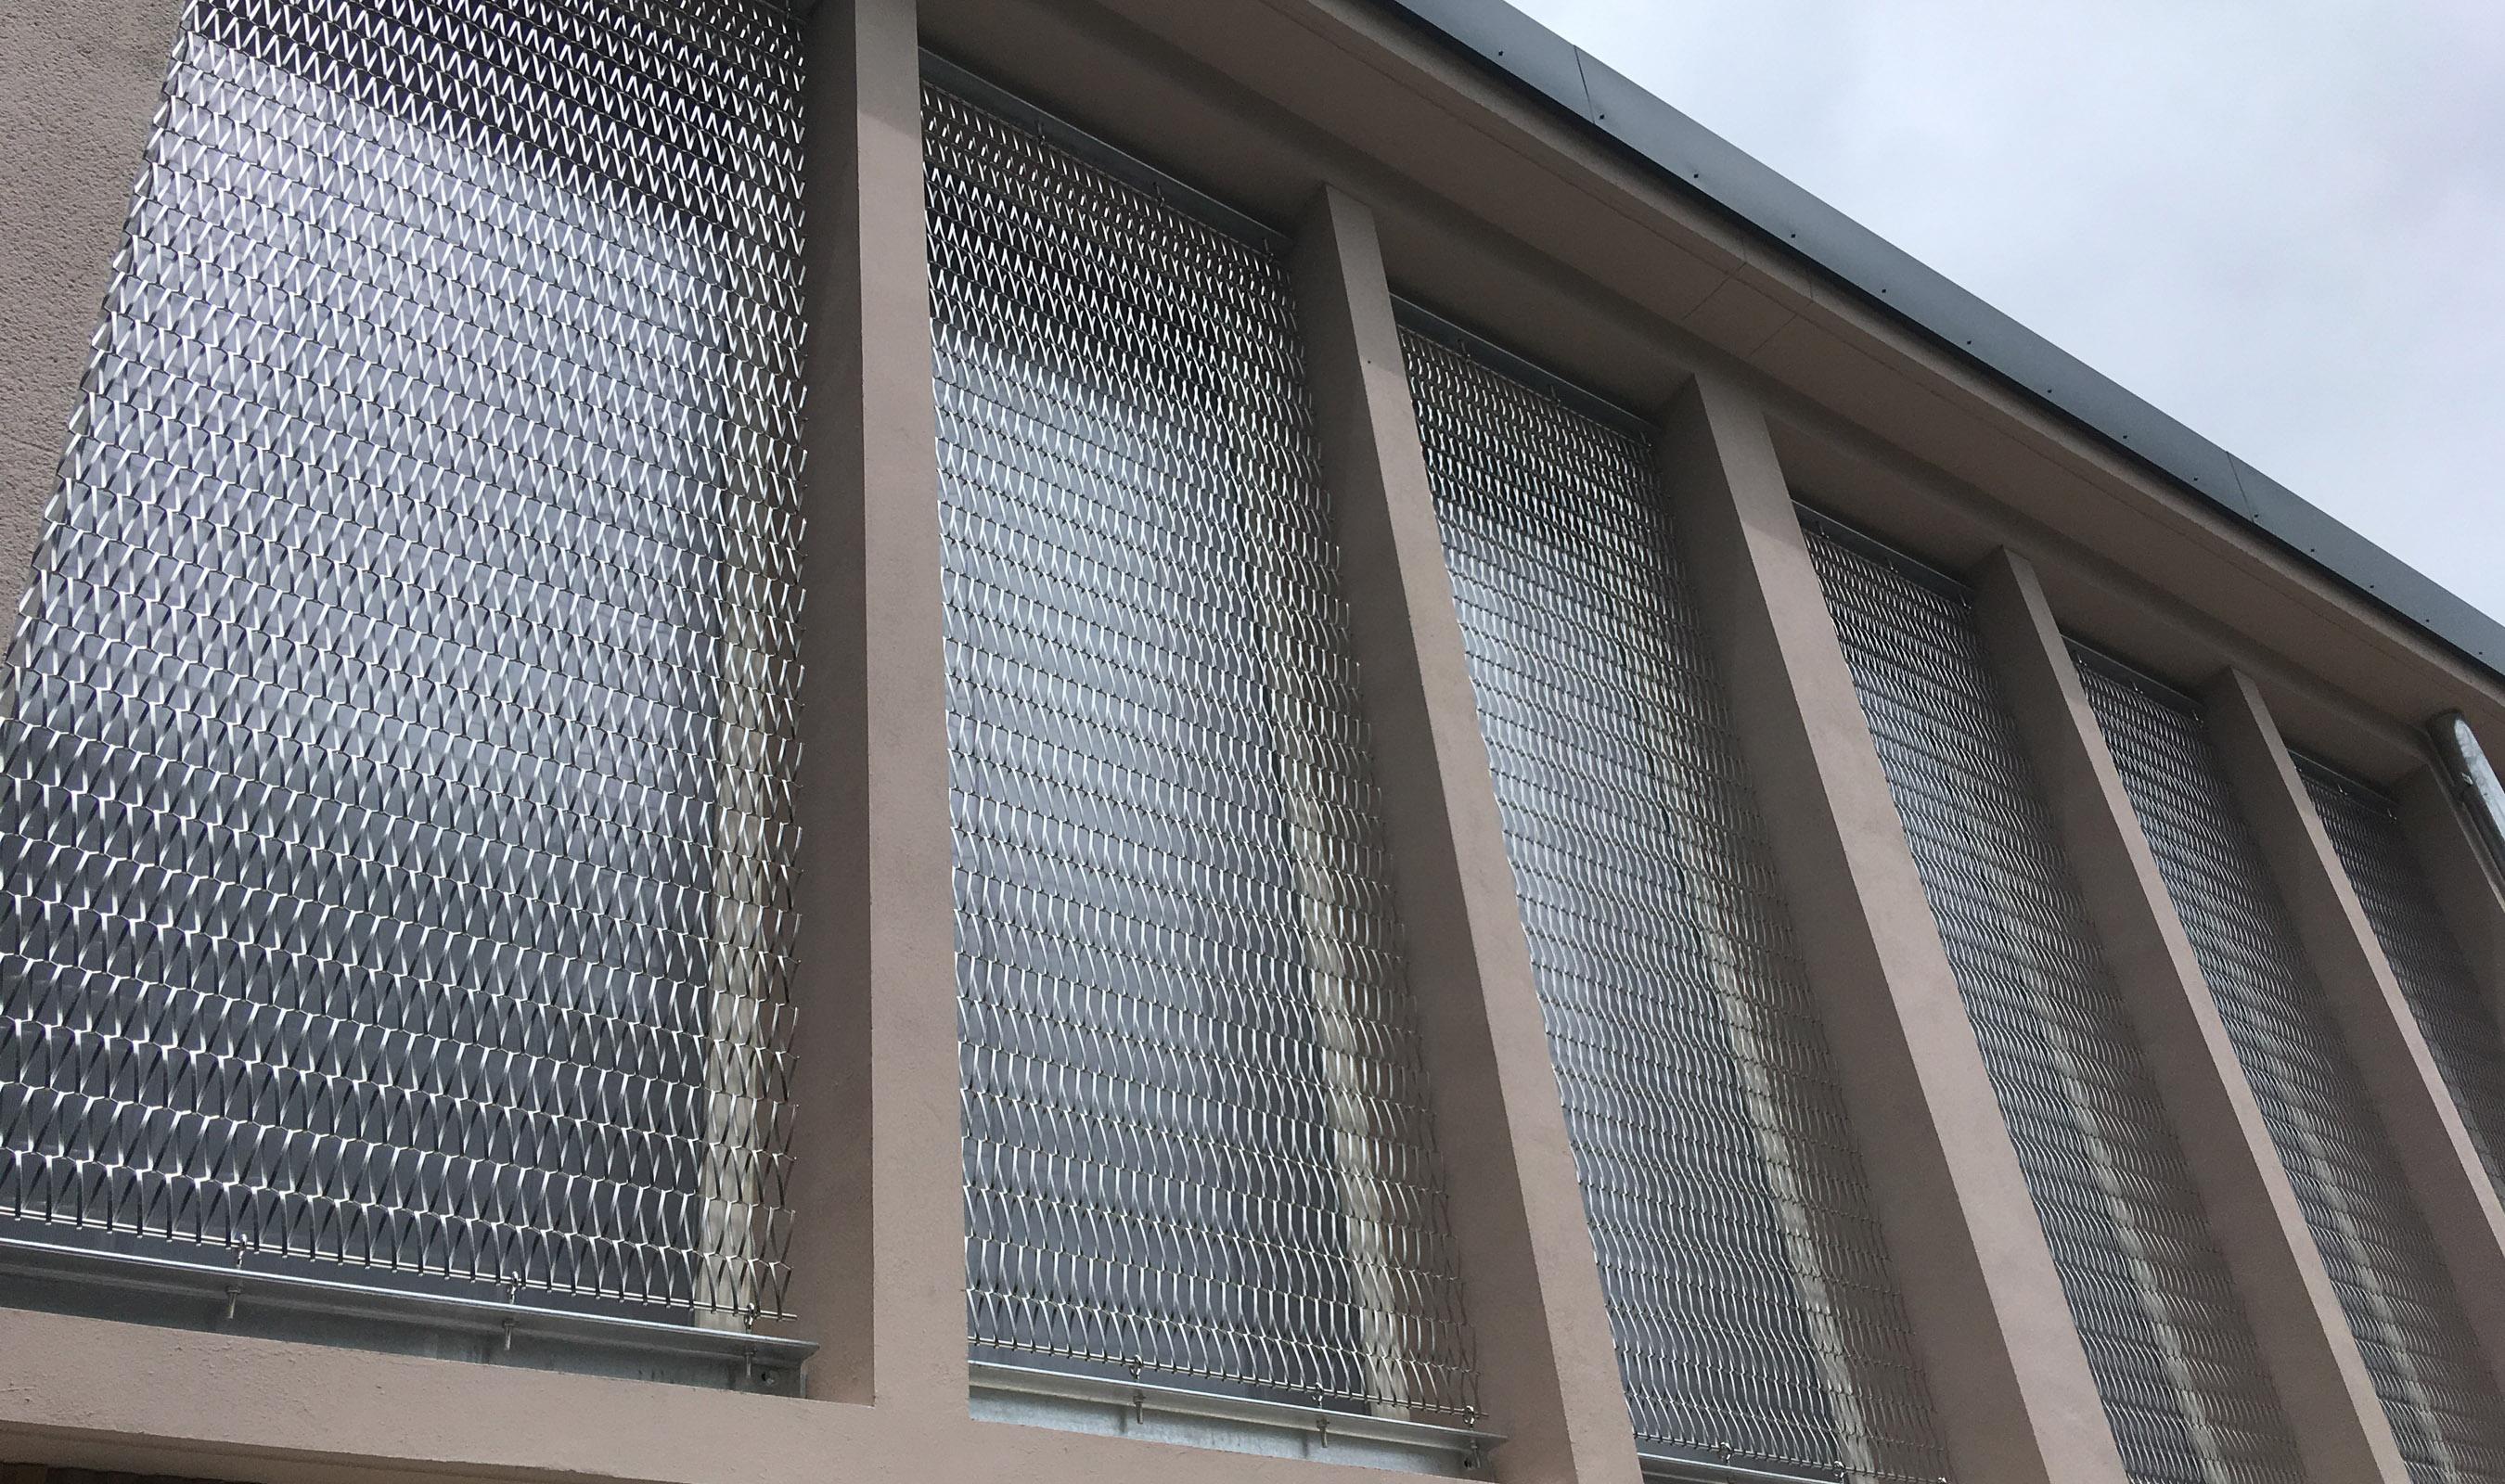 Dune 40100 flexible mesh for window guards